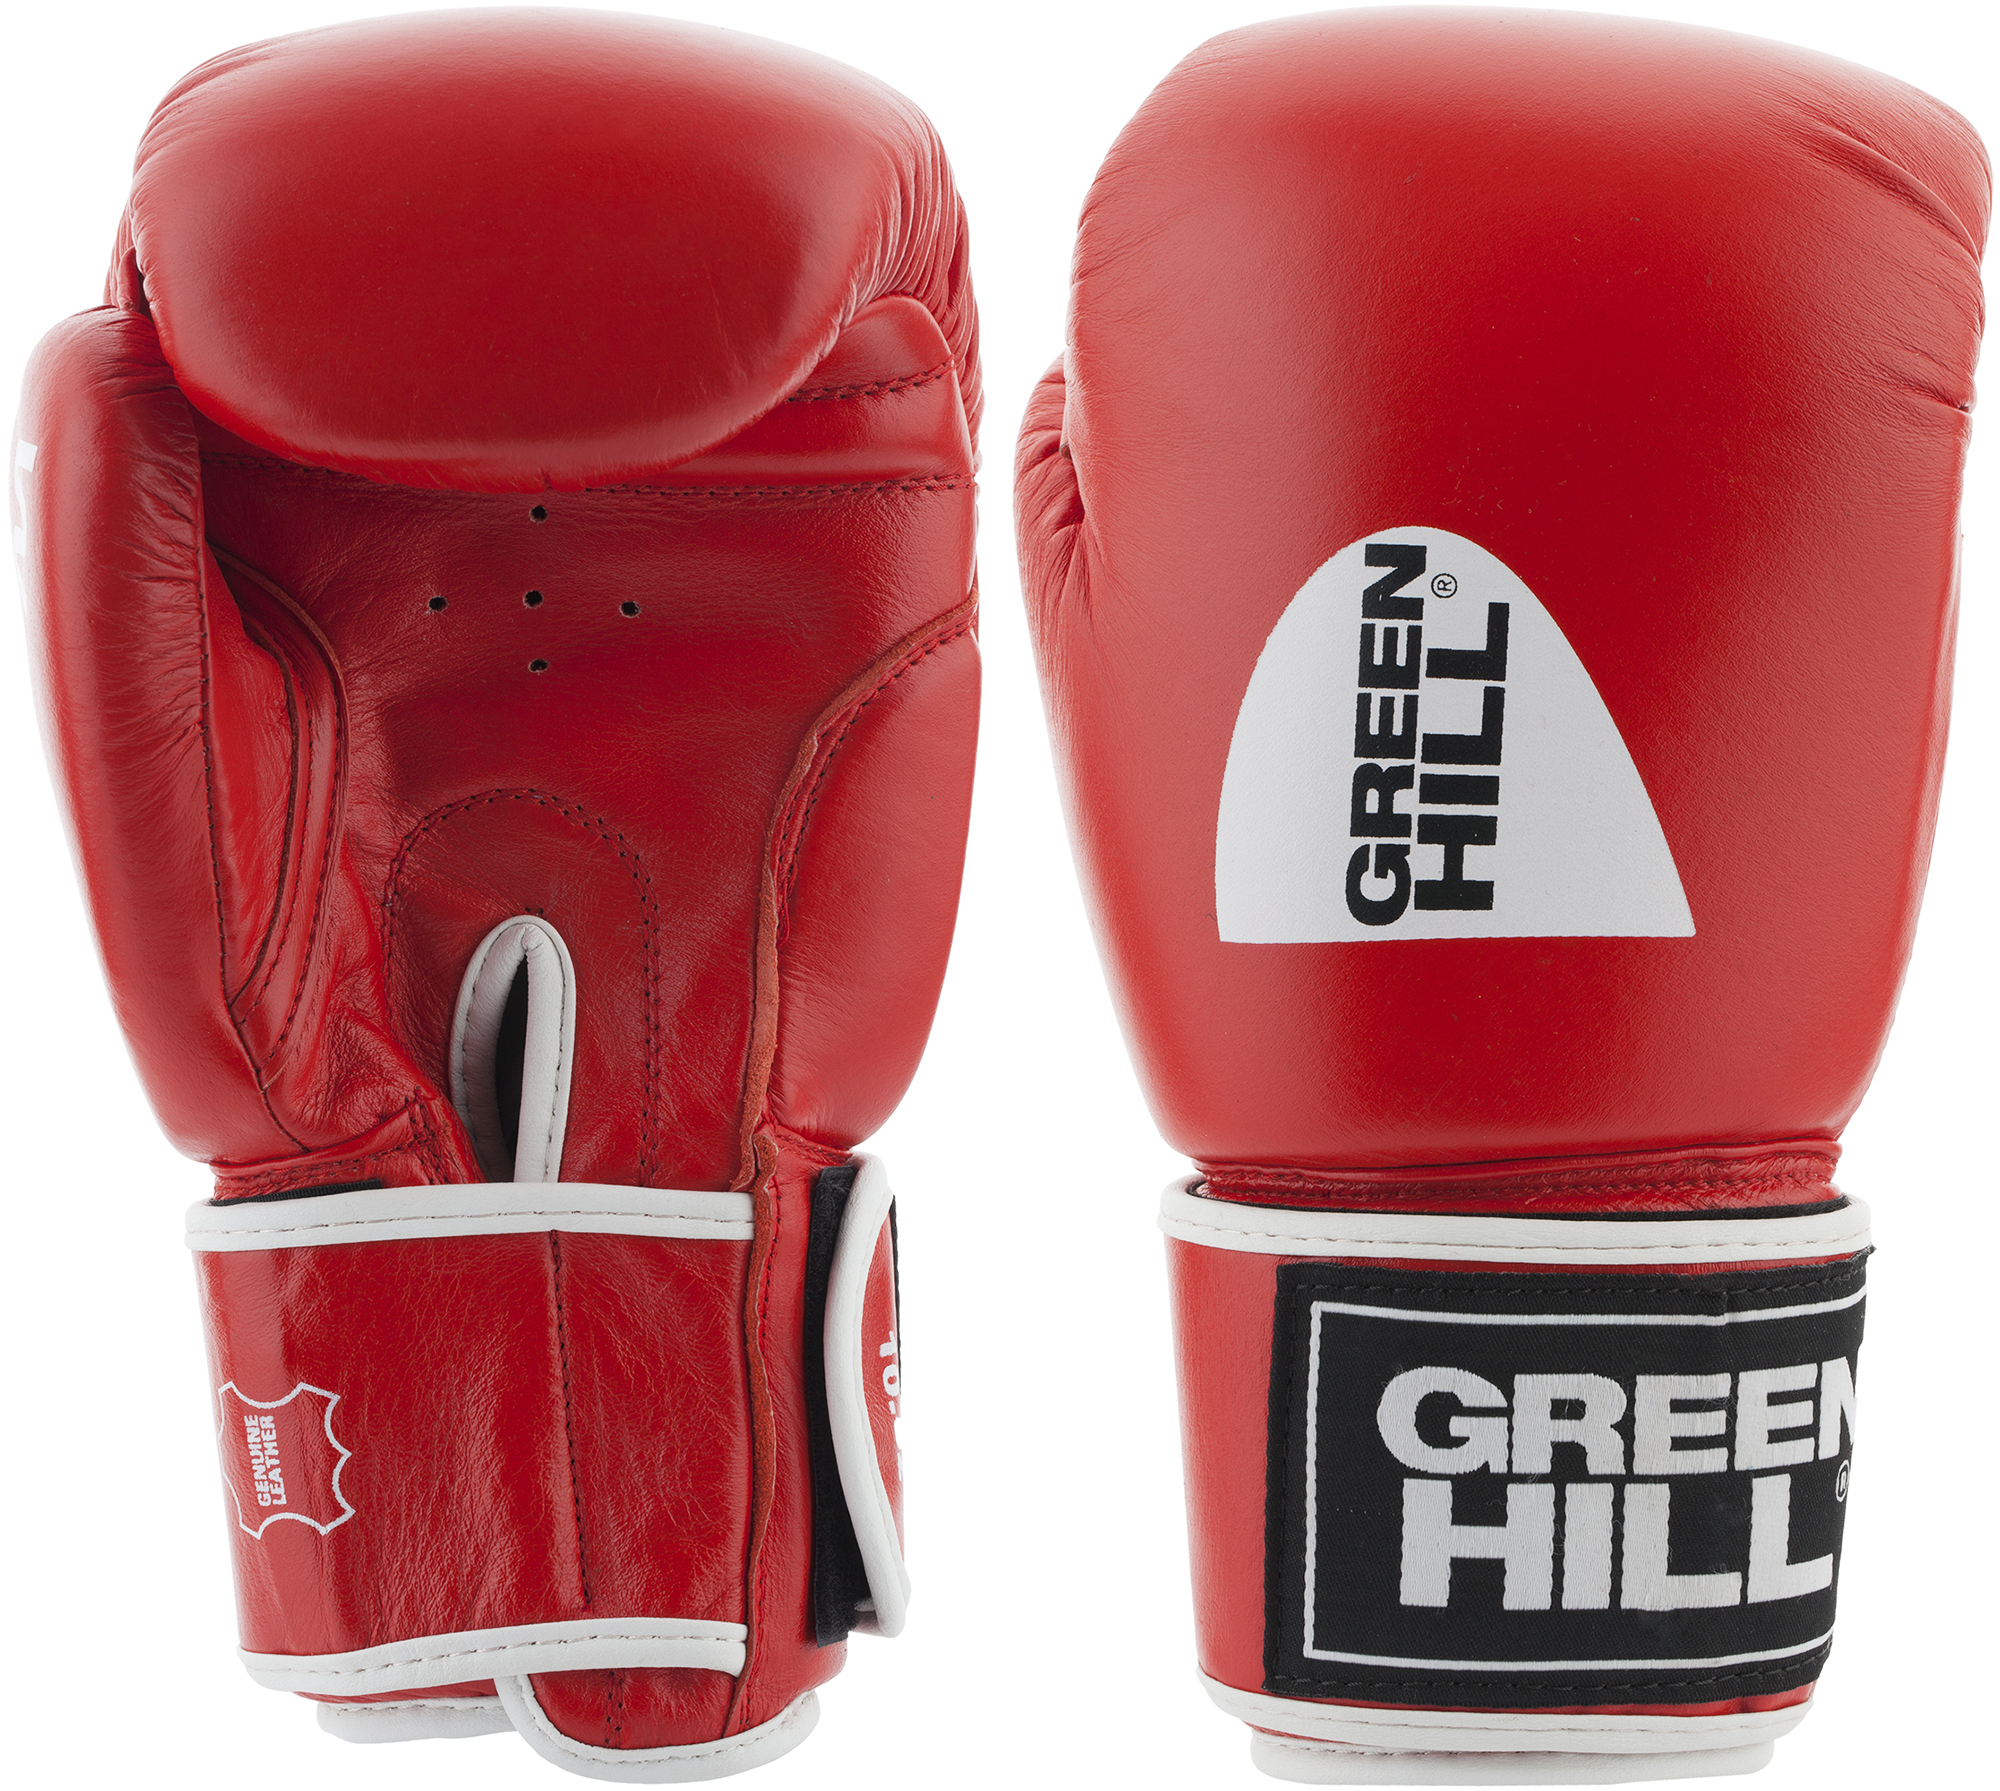 Green Hill Перчатки боксерские Green Hill Gym, размер 12 oz